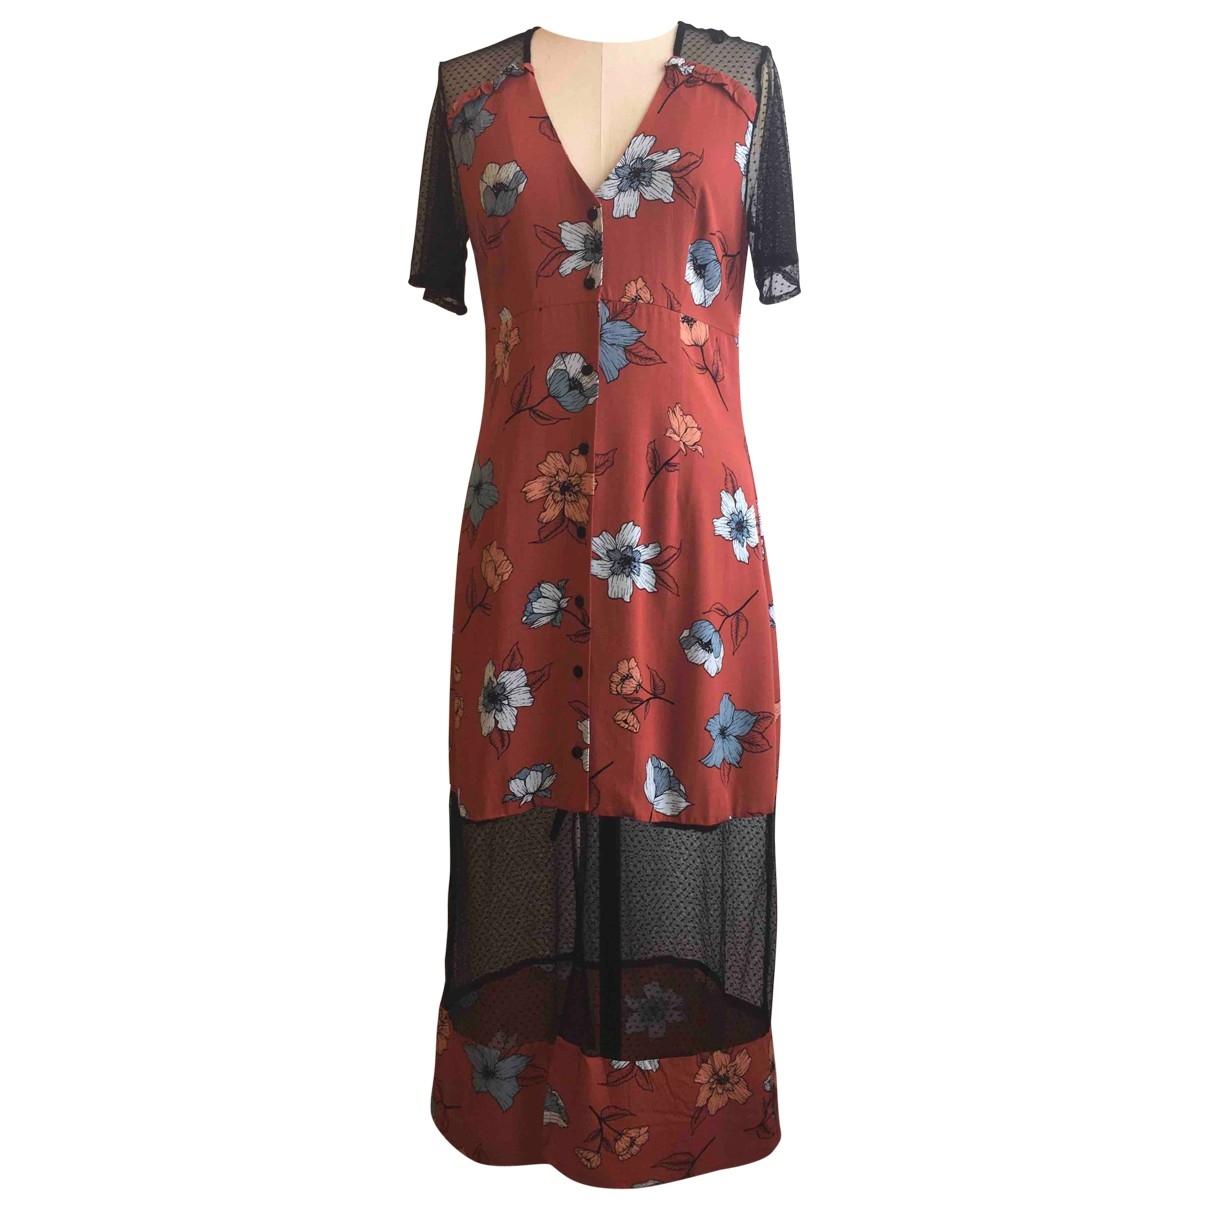 Minkpink \N dress for Women S International